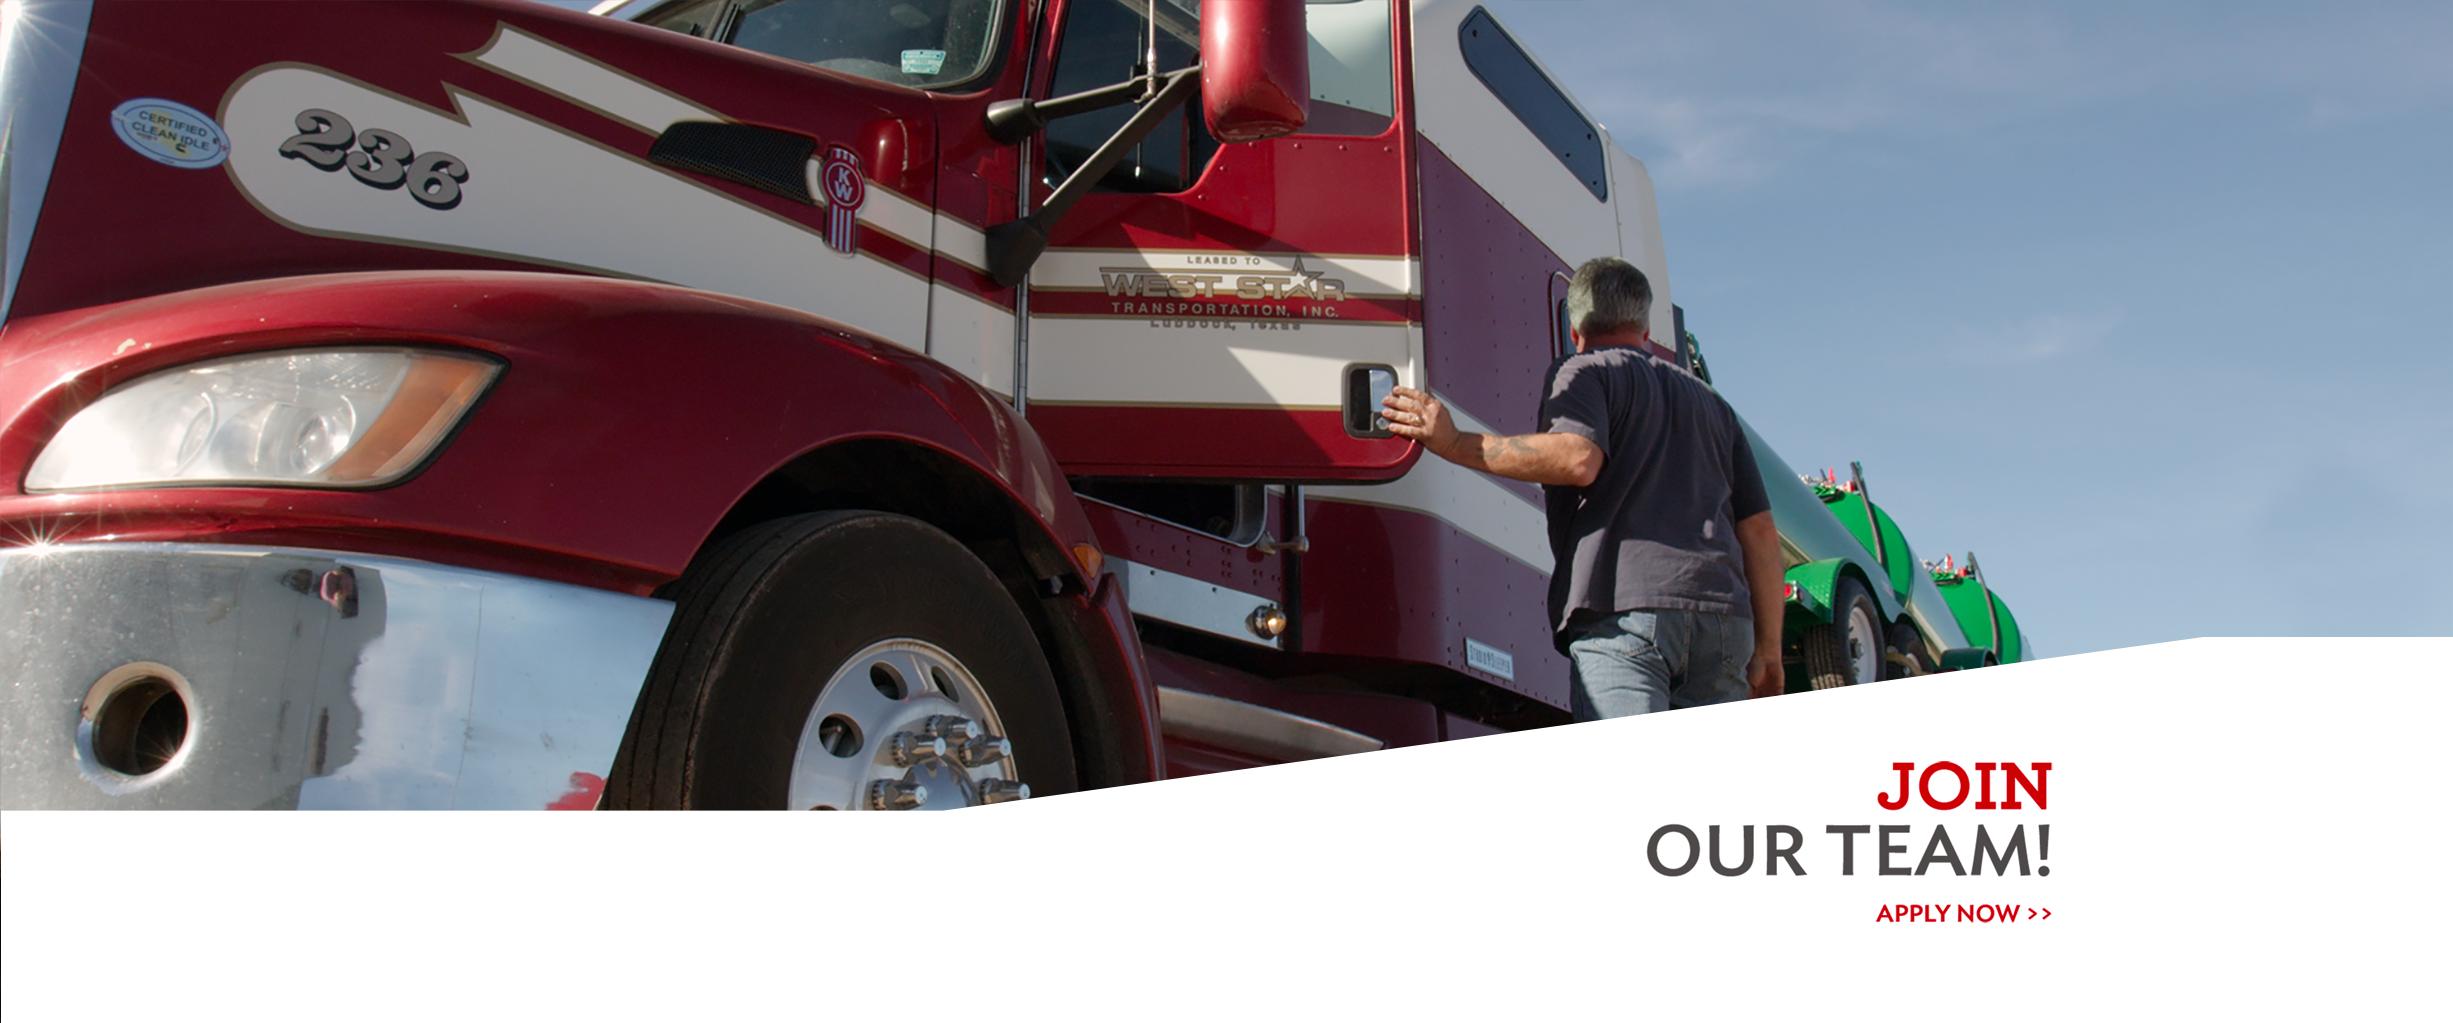 Trucking Company - West Star Transportation